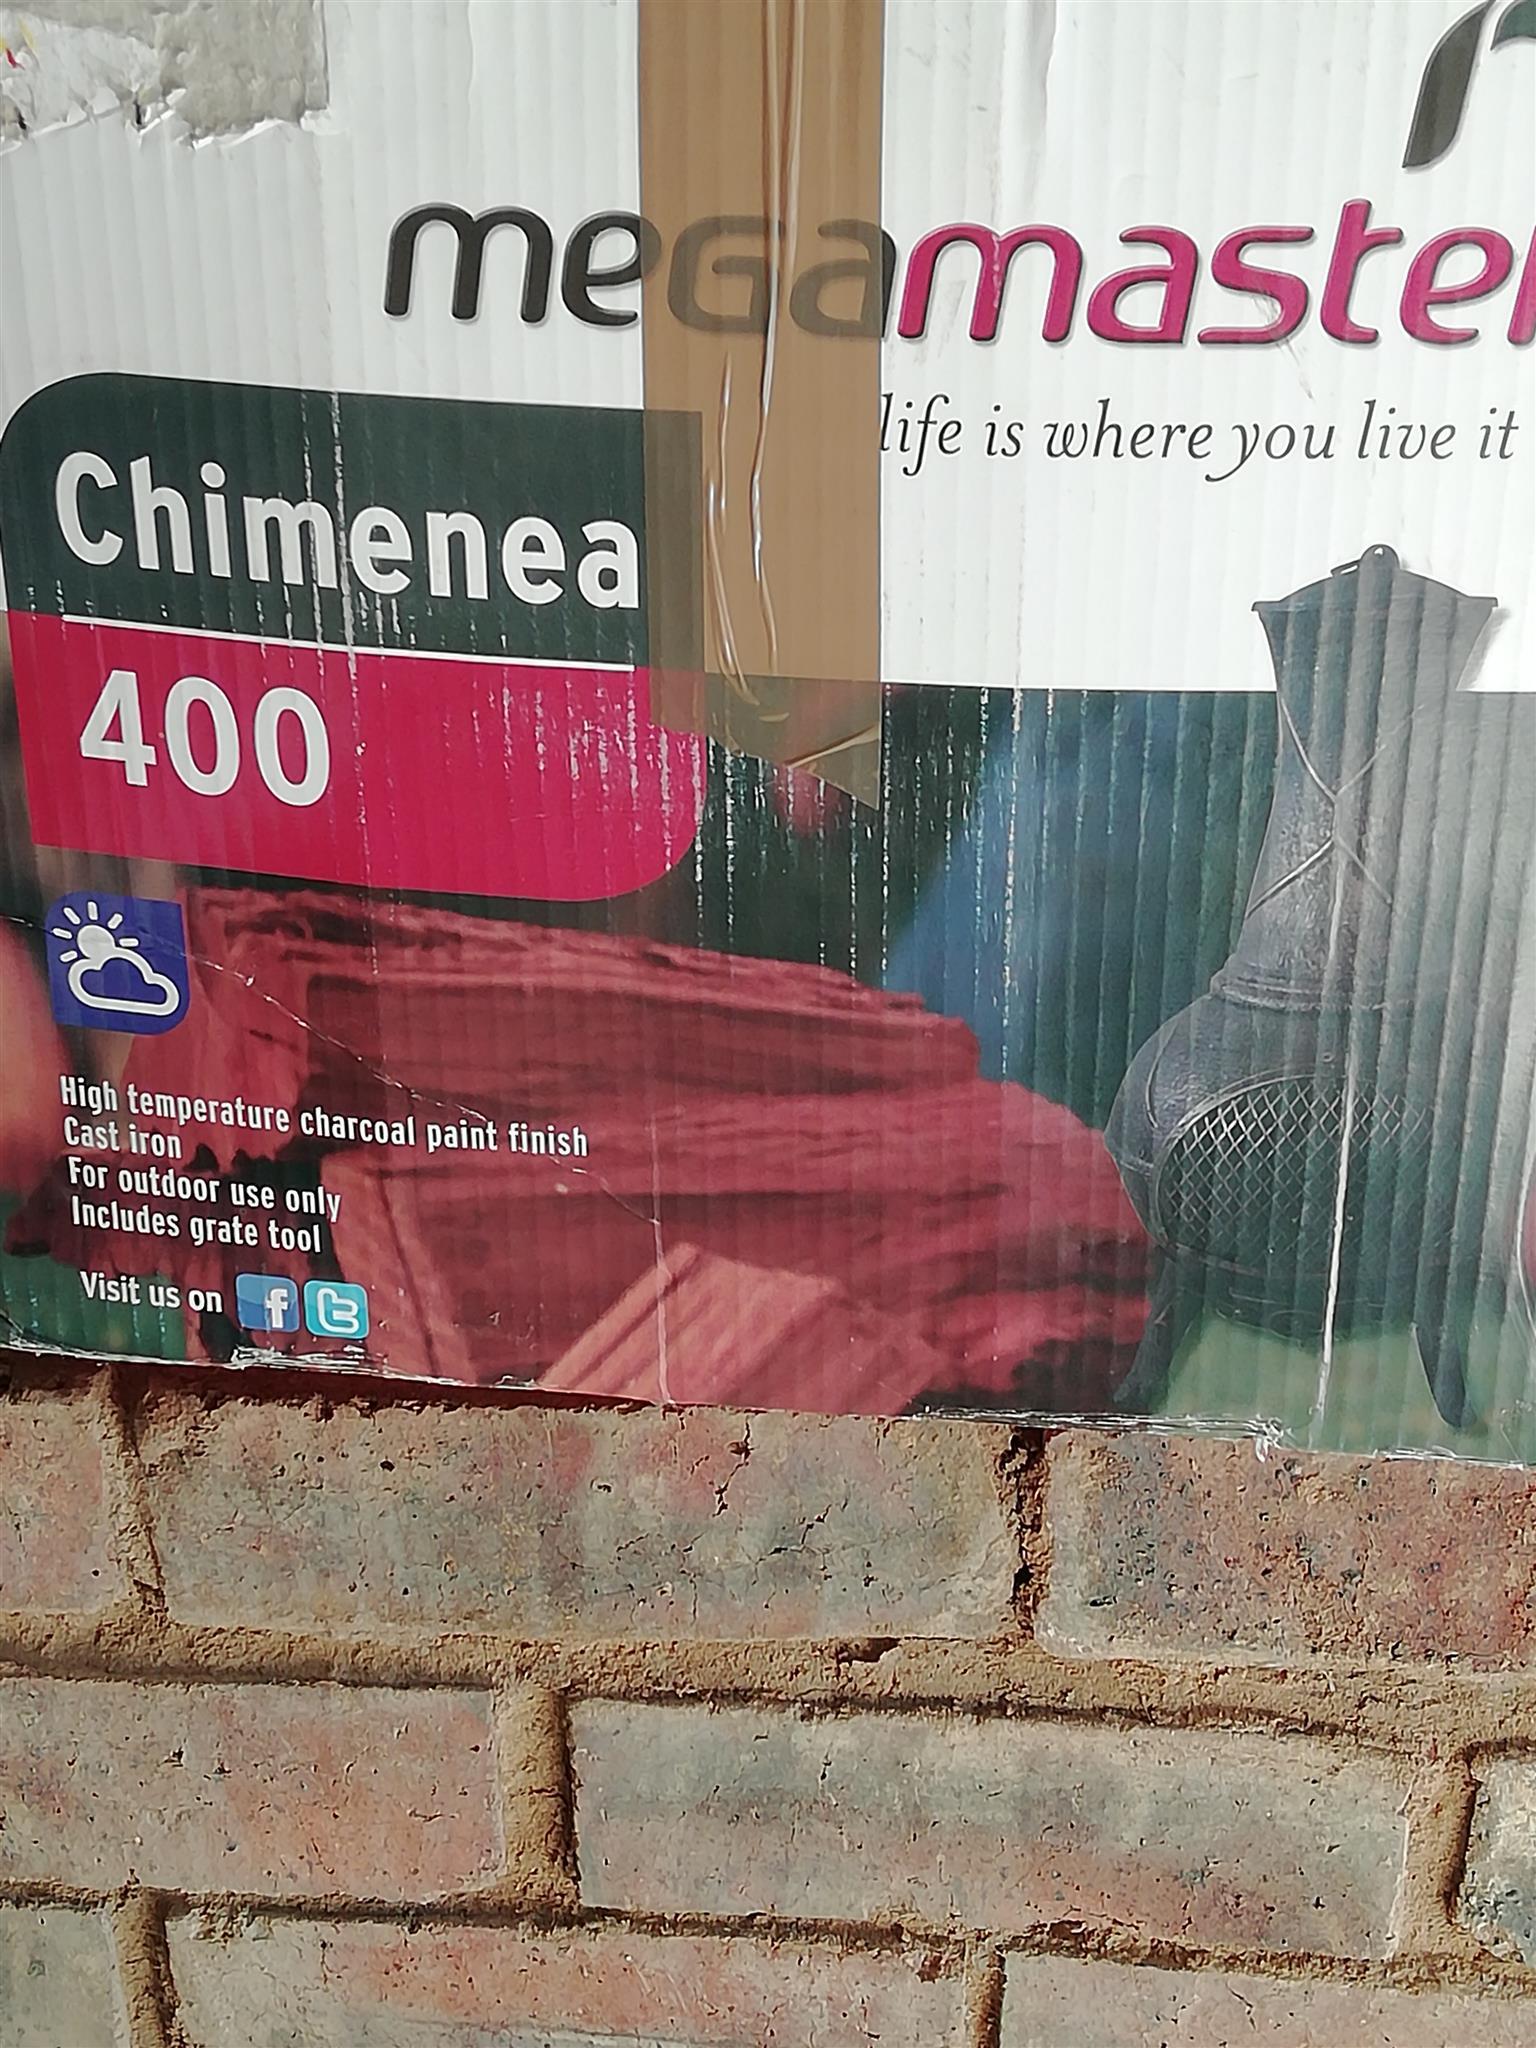 Chimenea 400 megamaster